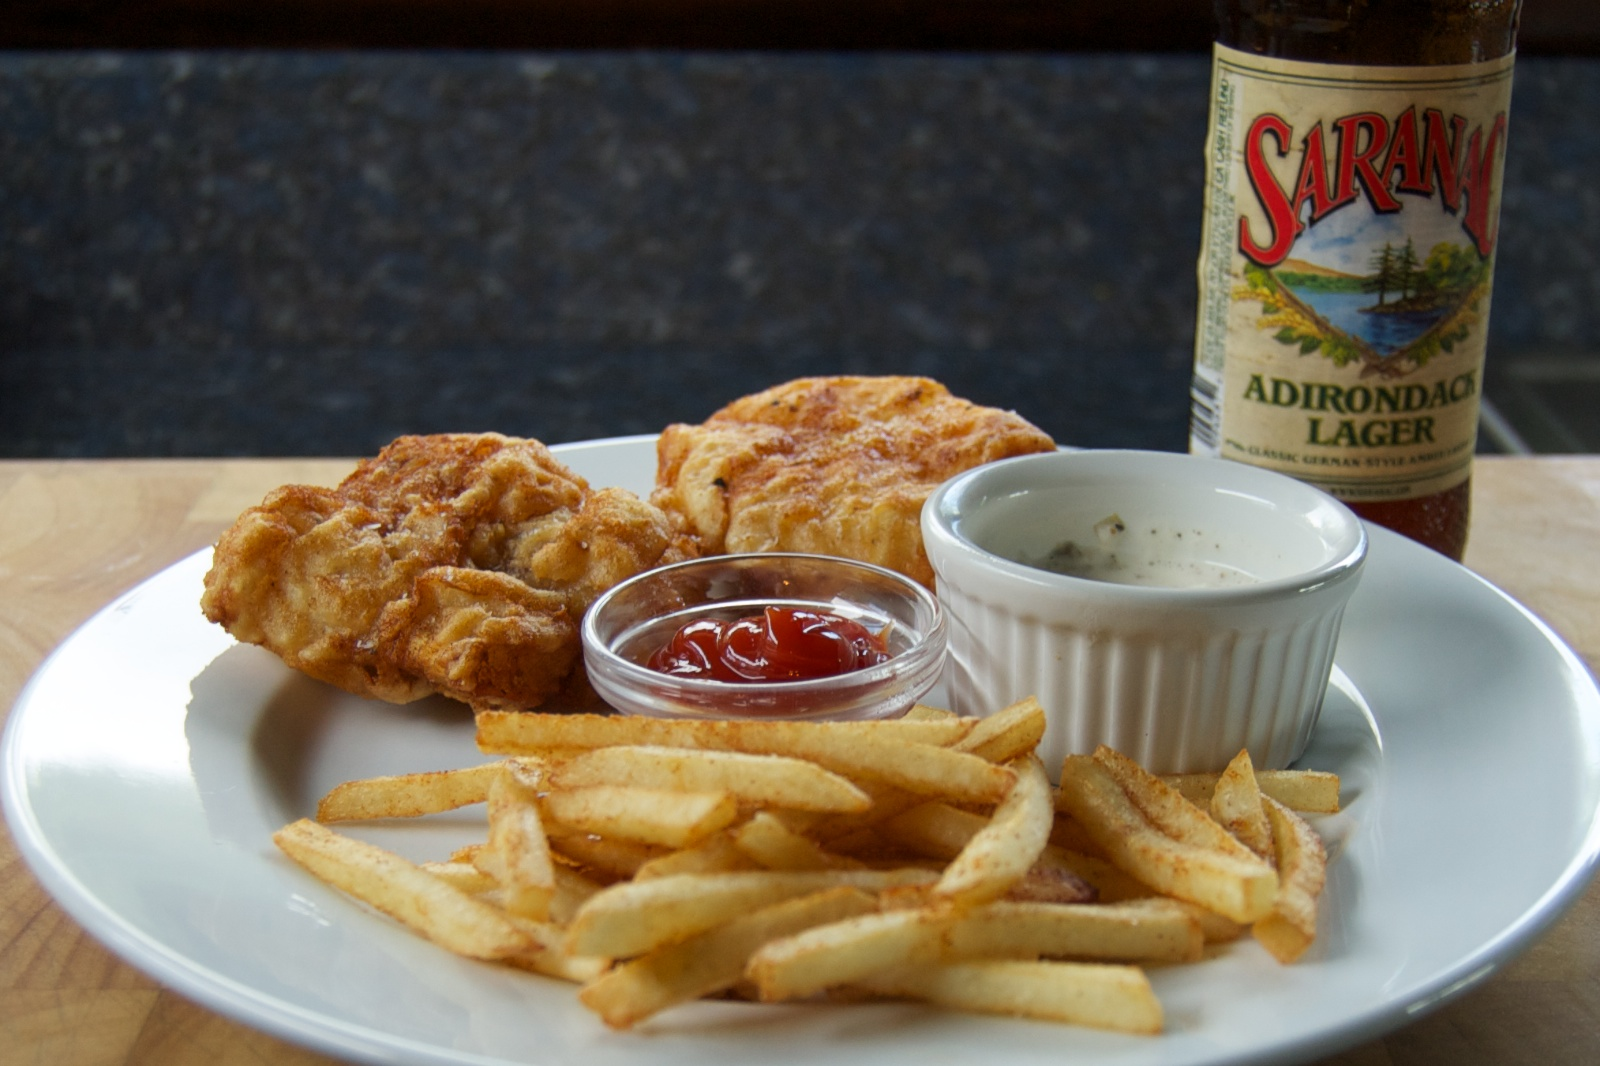 http://blog.rickk.com/food/2011/09/09/ate.2011.09.09.d.jpg